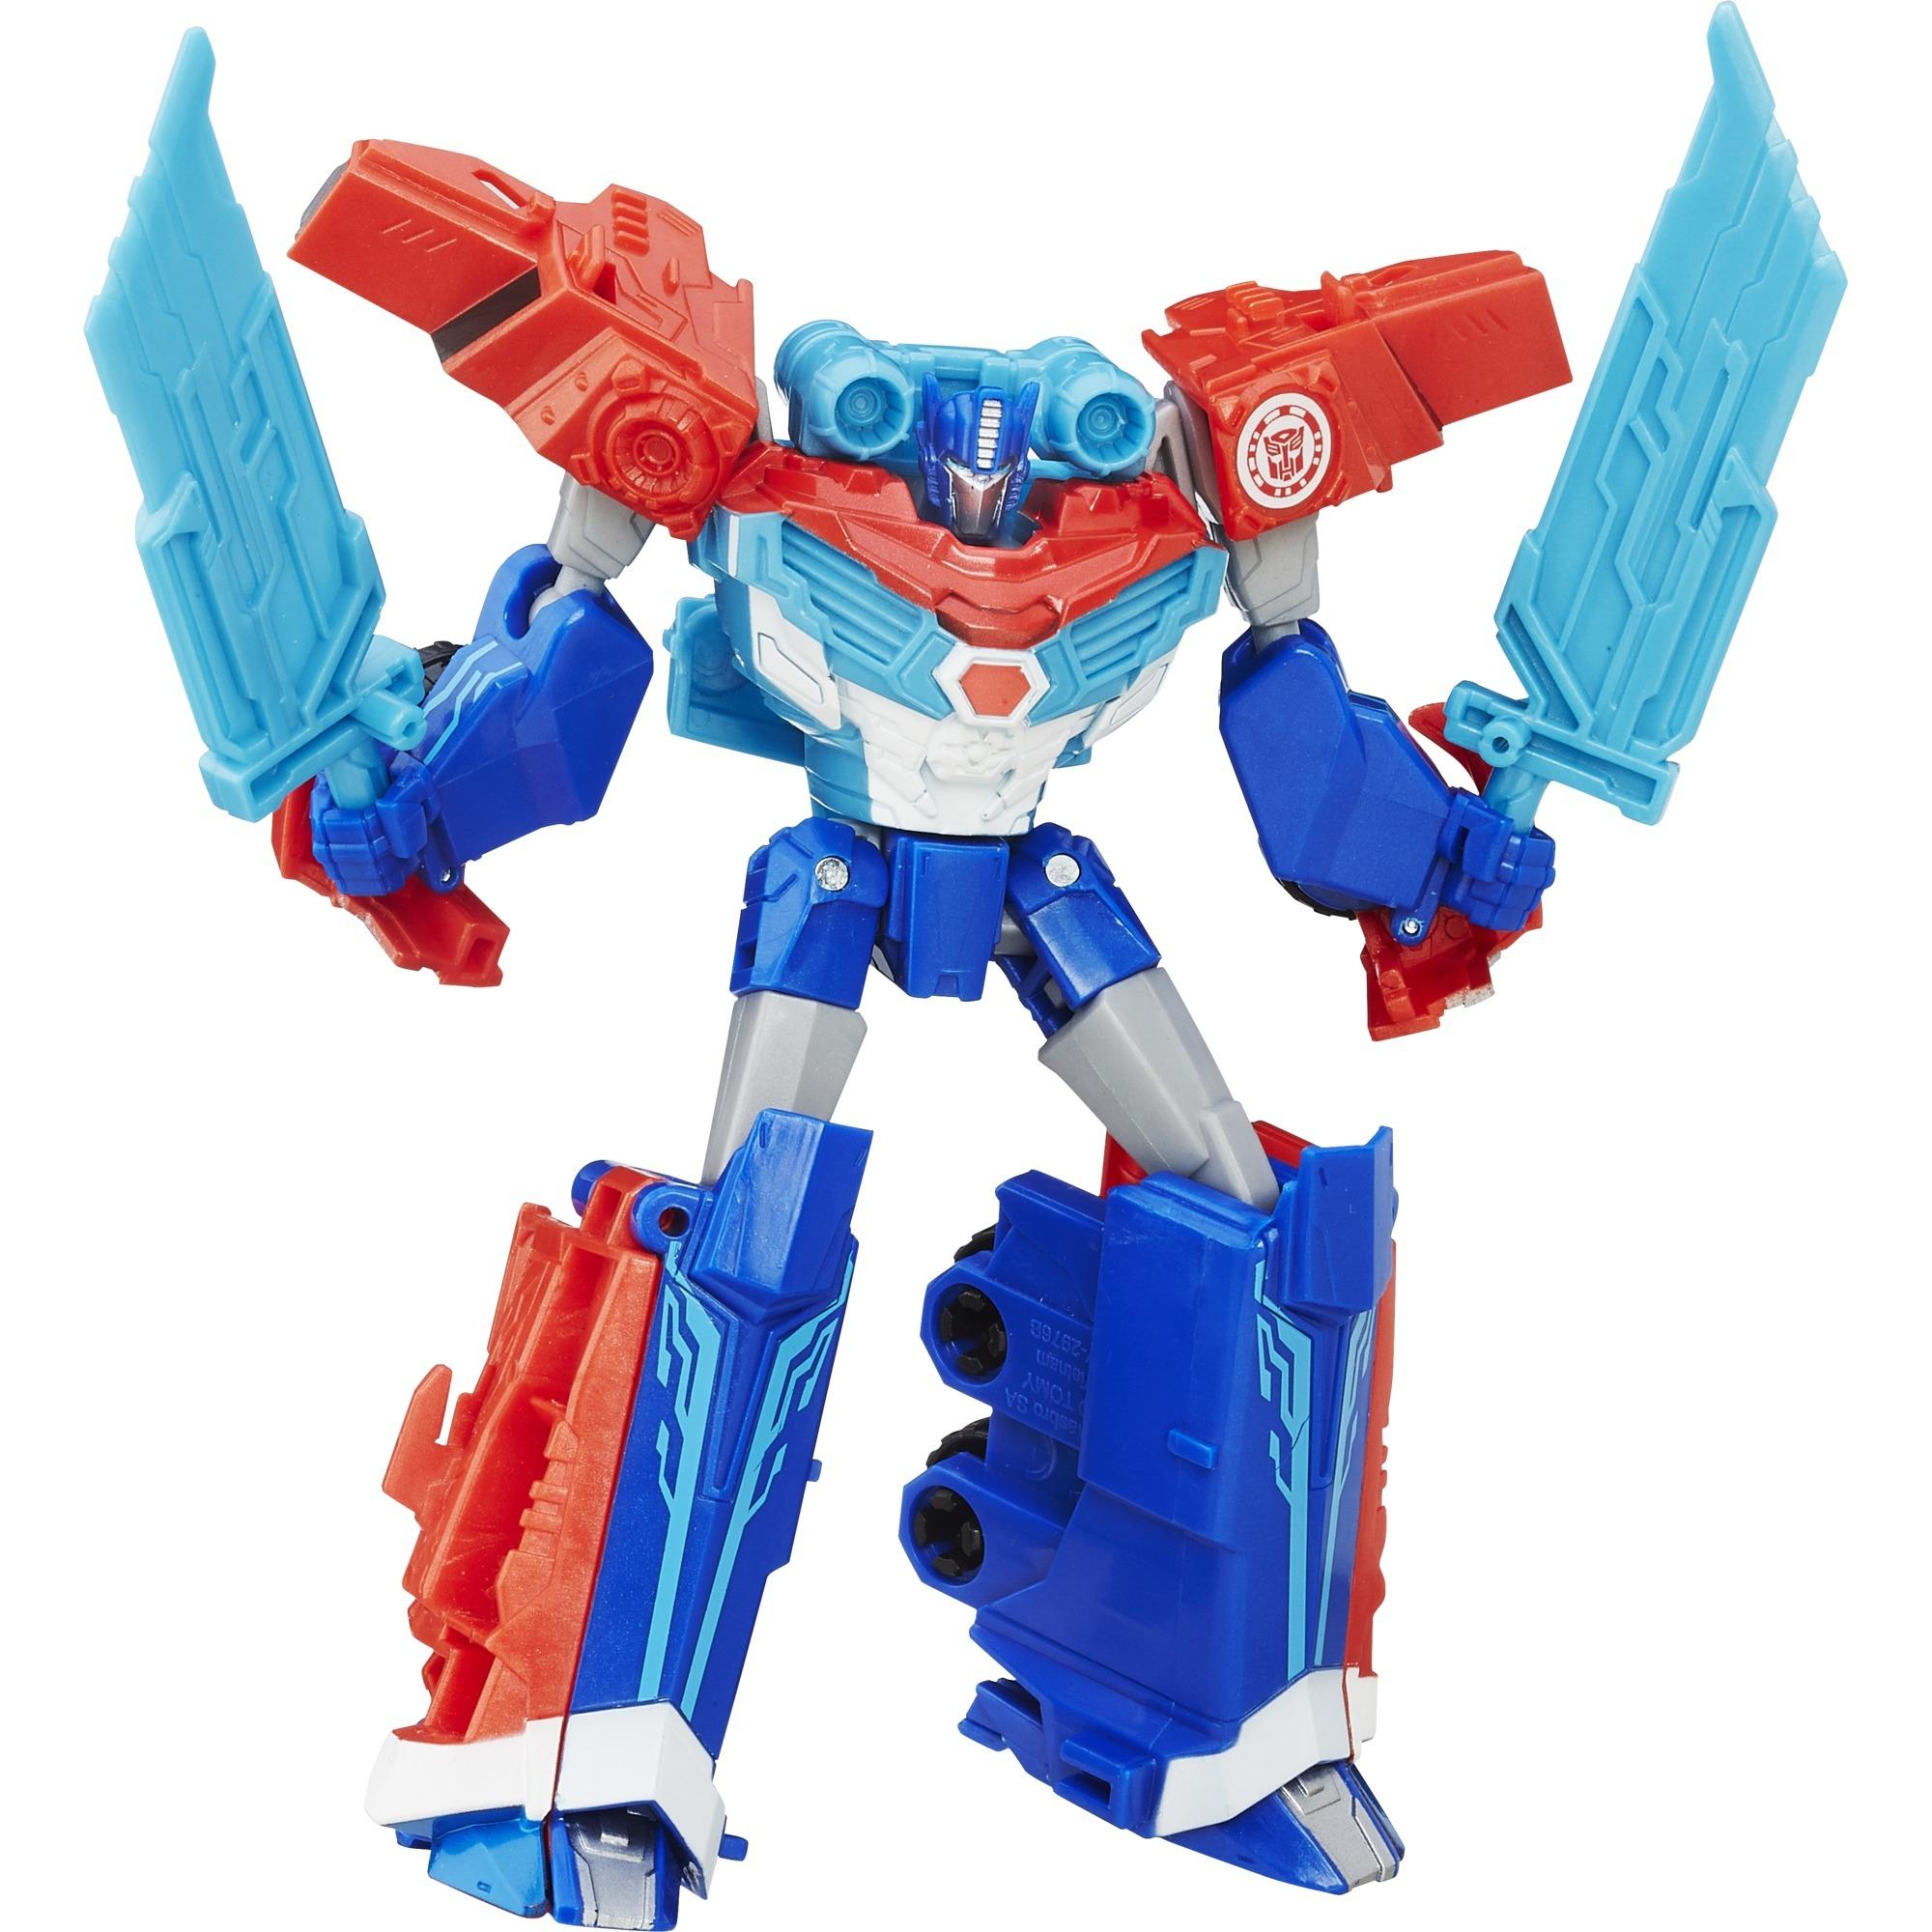 transformers-rid-warriors-optimus-prime-spil-figur